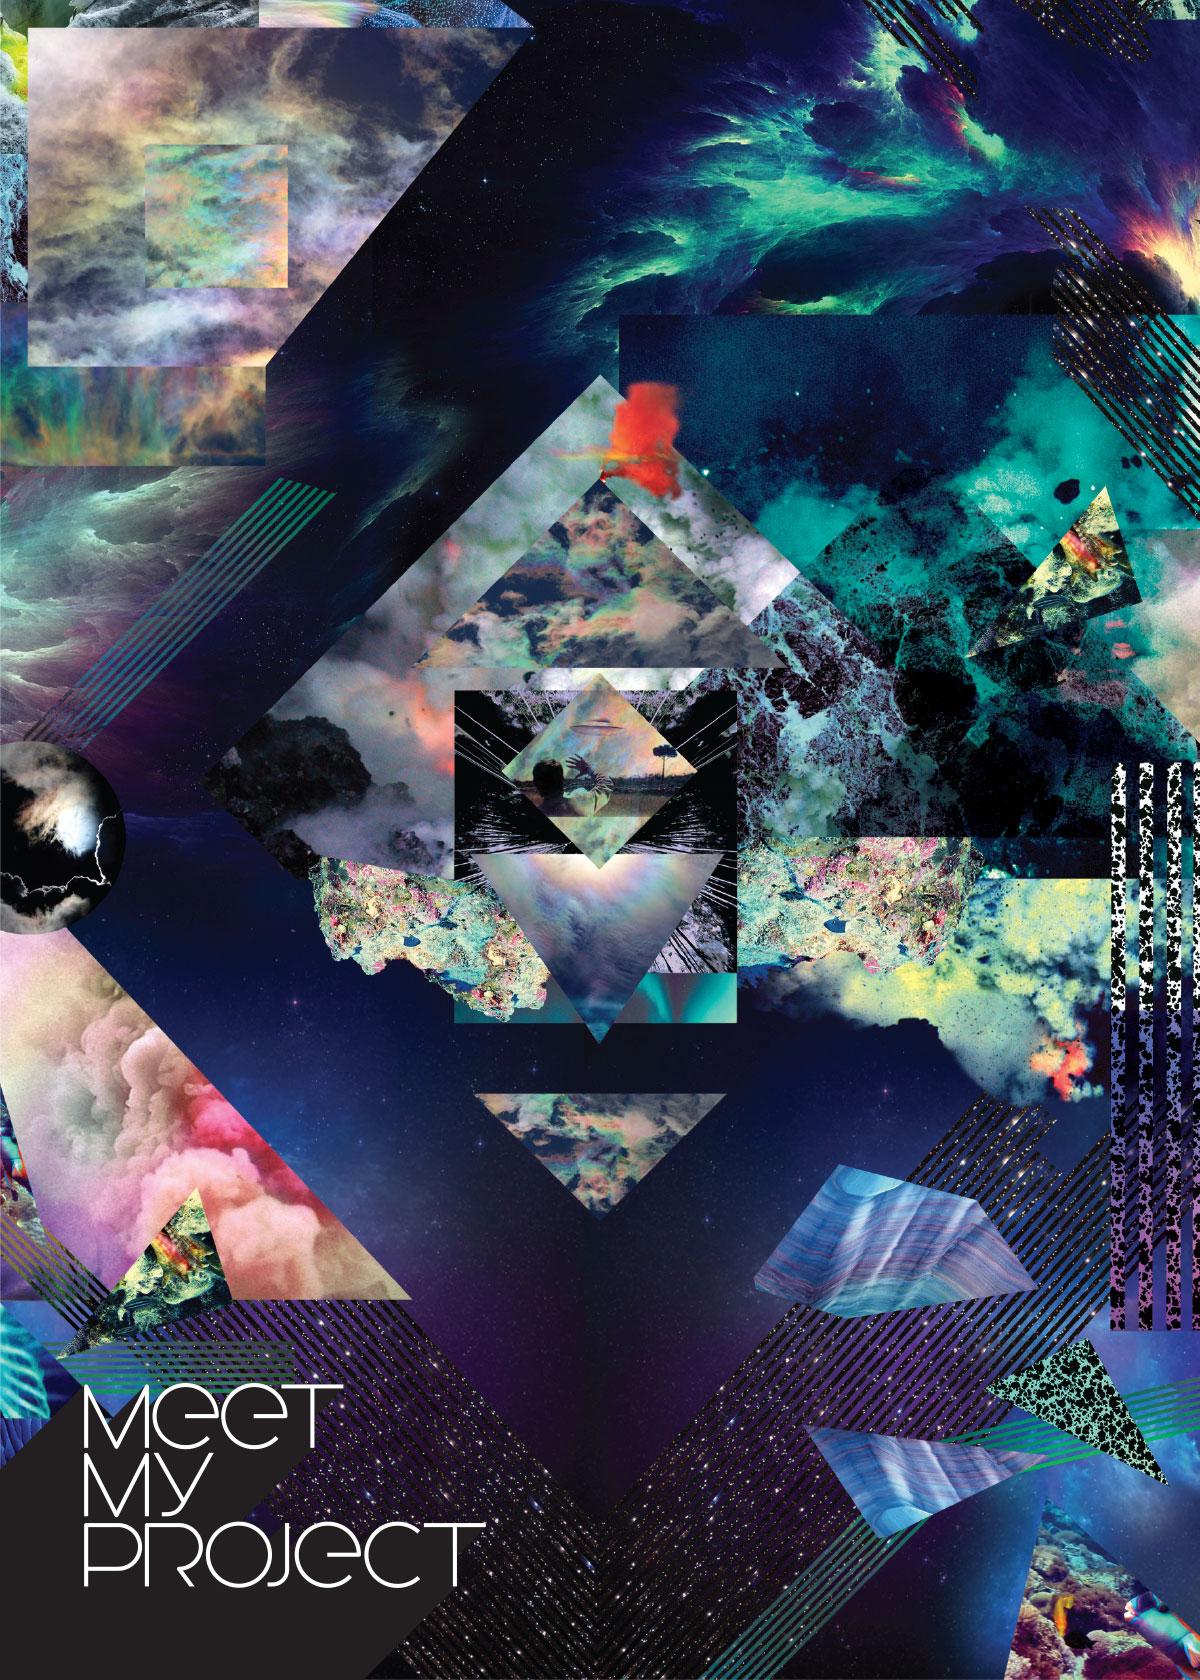 Meet My Project 2014 Milan Poster